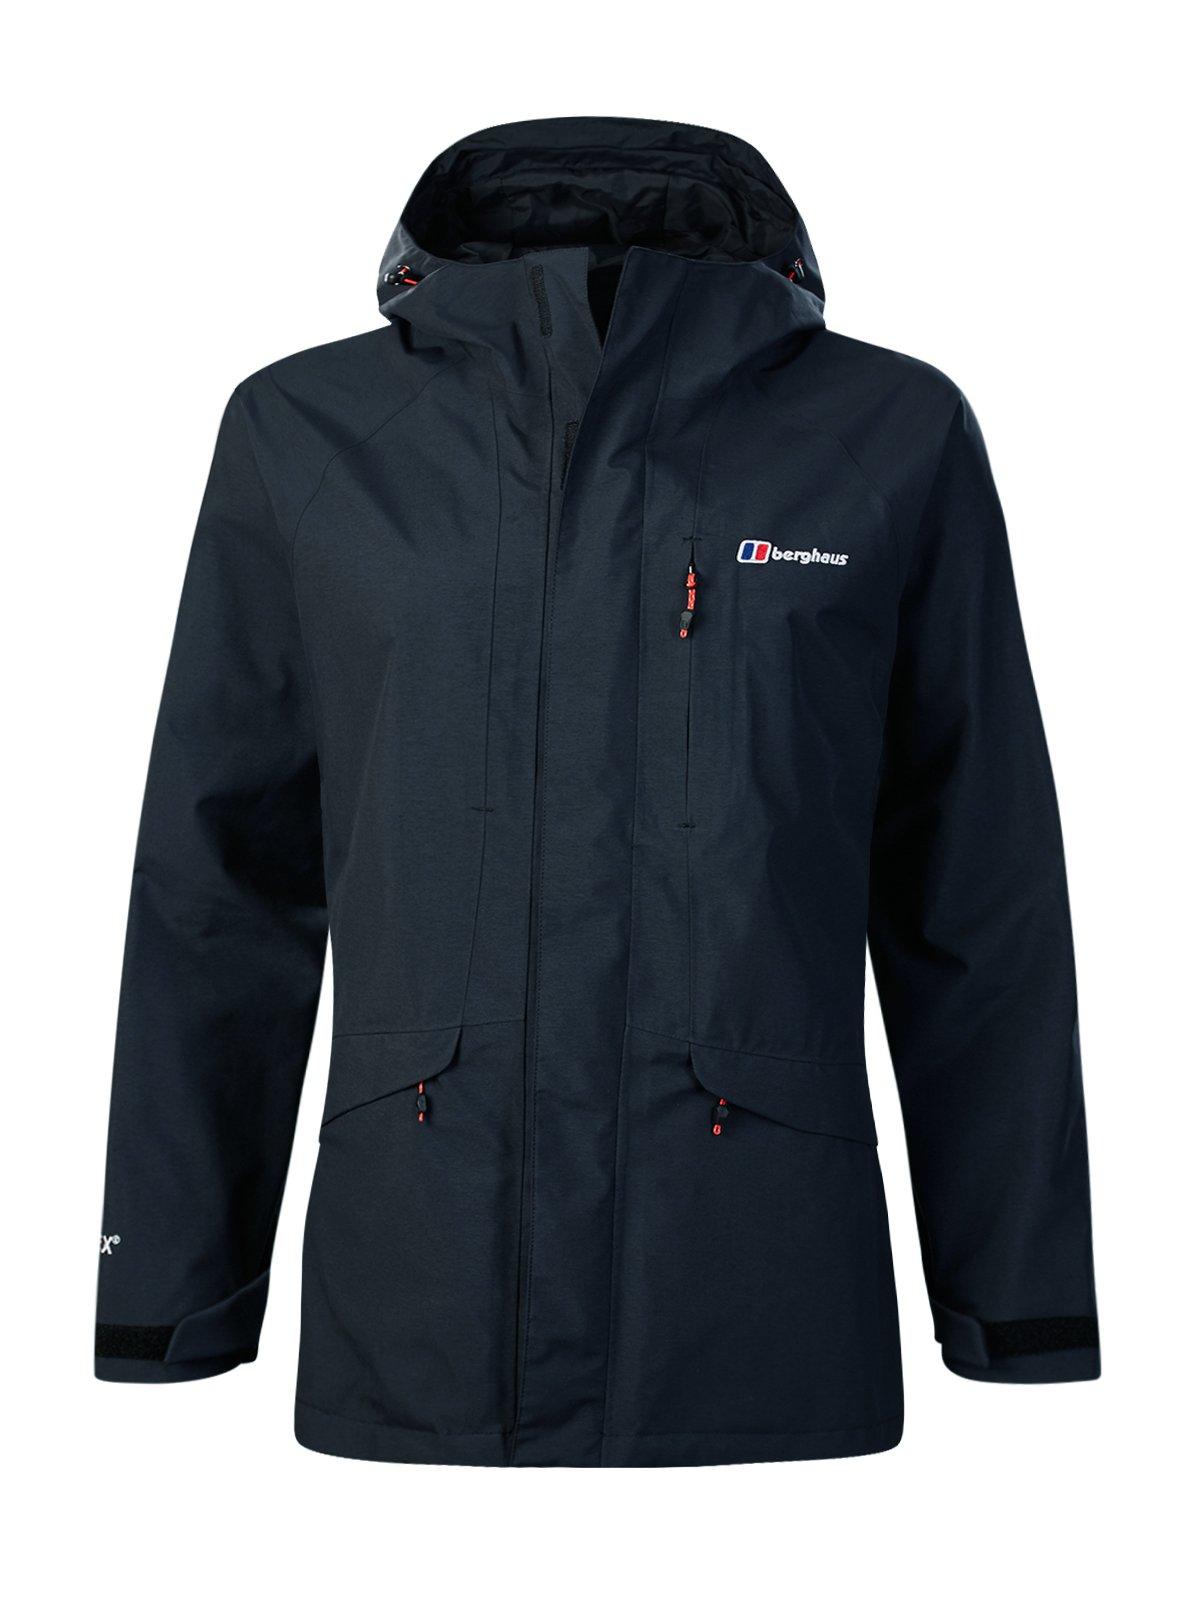 61841Rw71KL - Berghaus Women's Hillmaster Gore-tex Waterproof Jacket